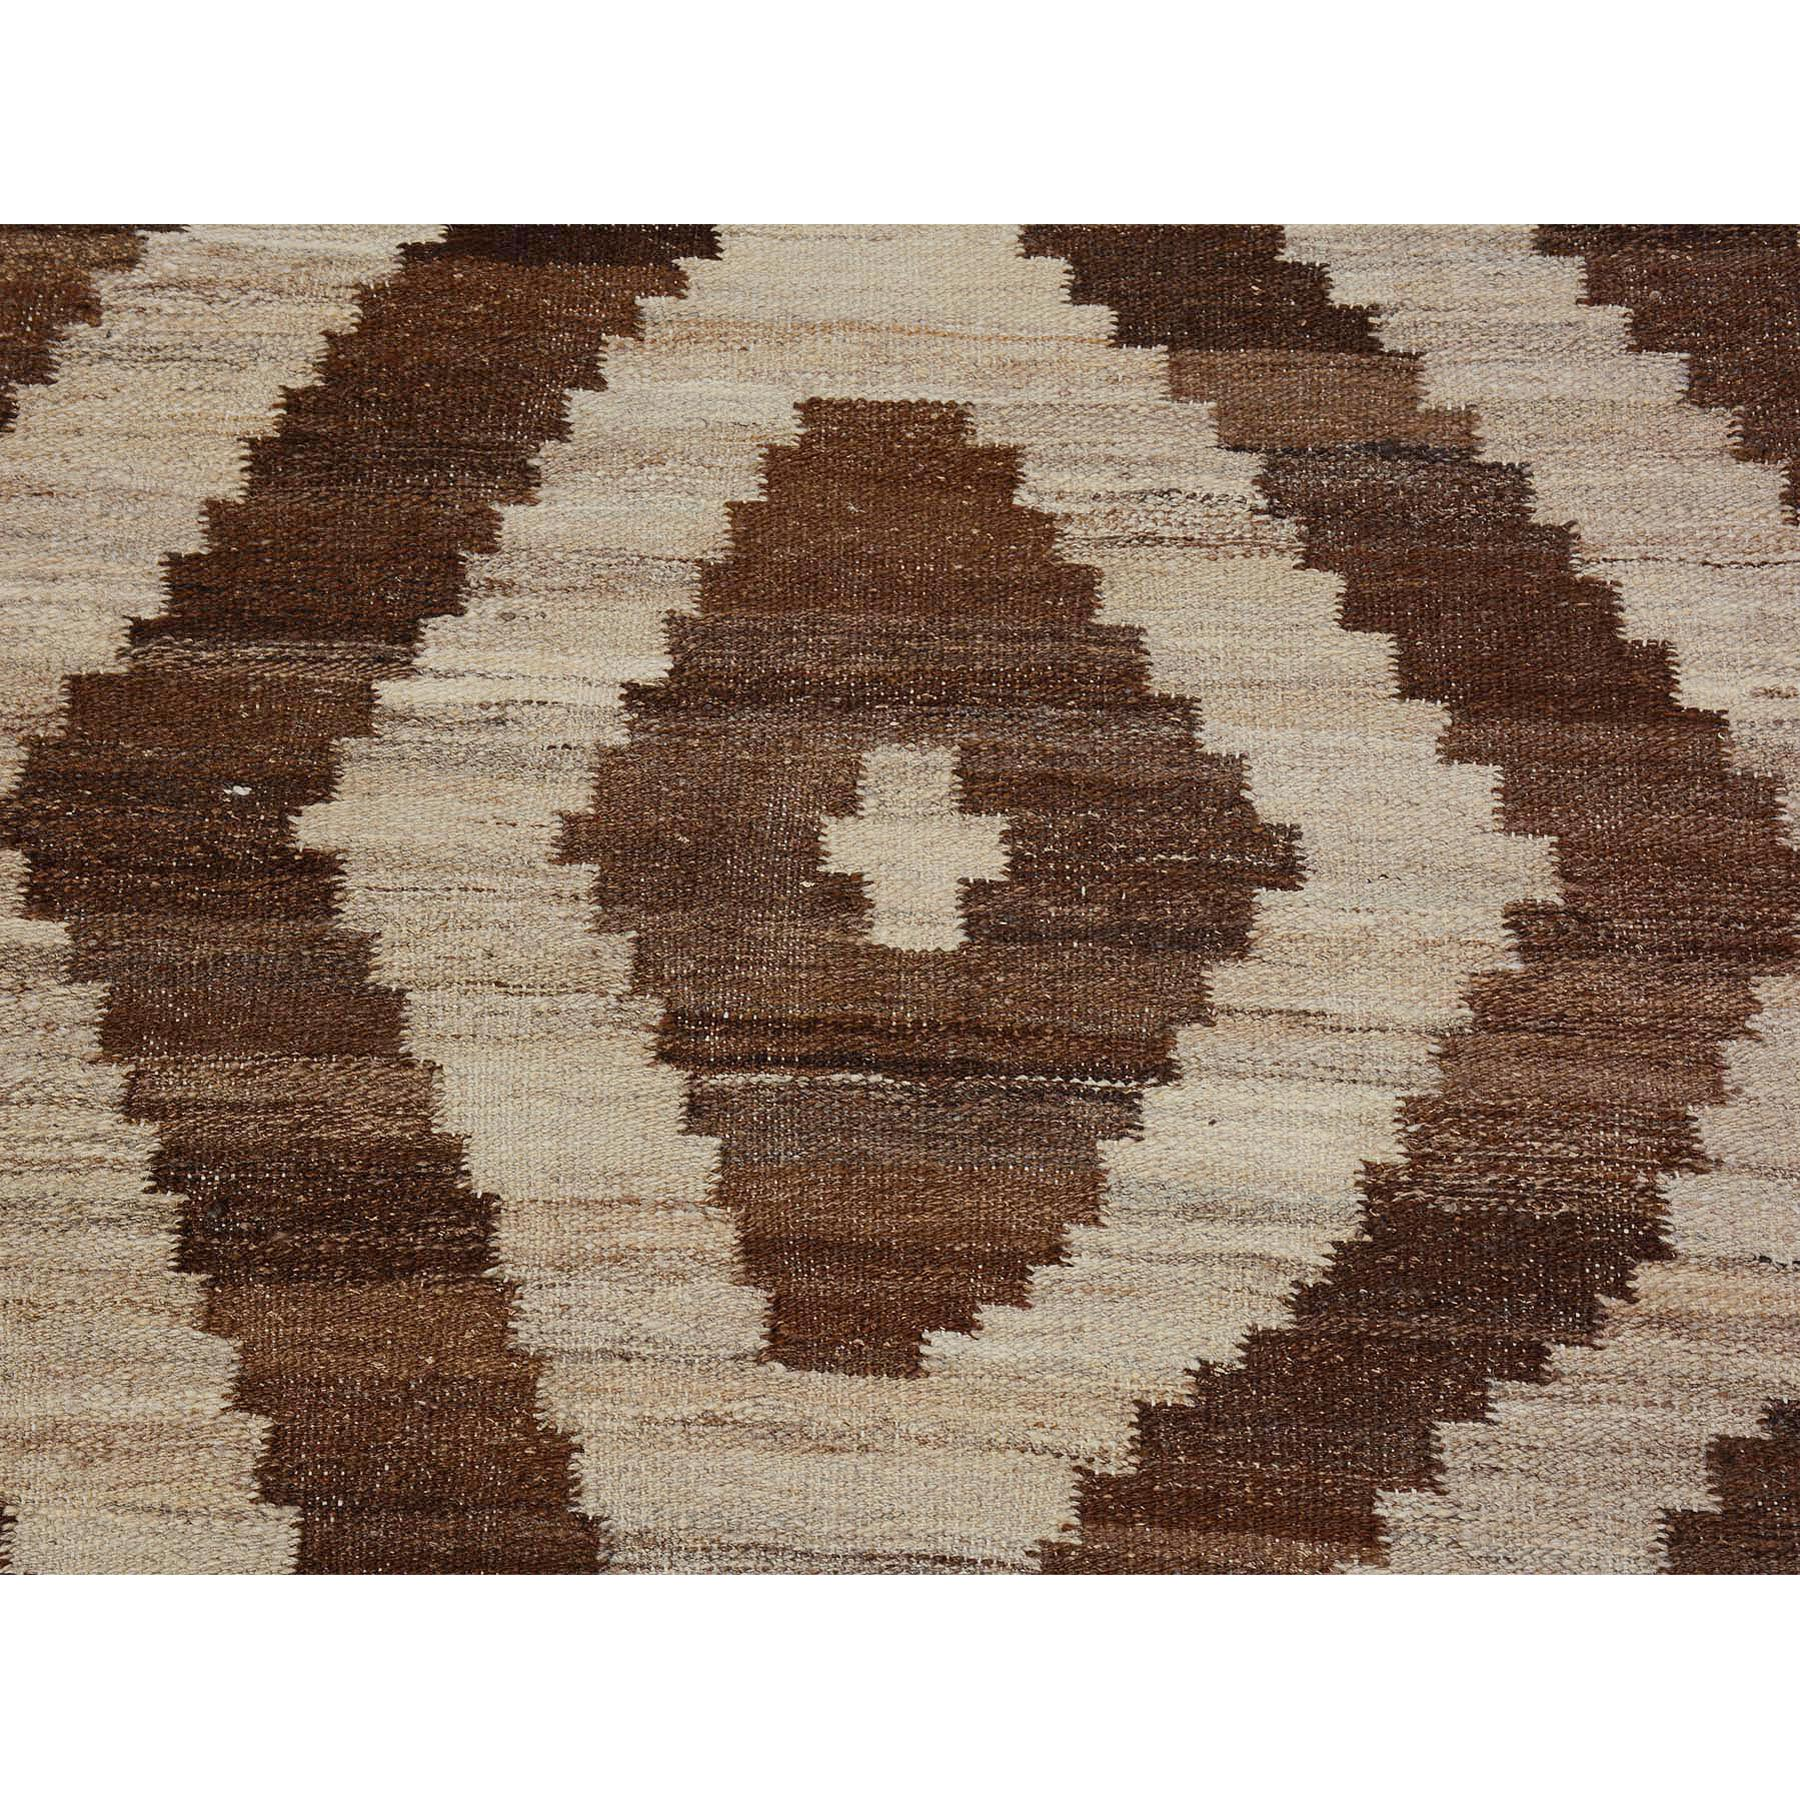 2-8 x9-10  Brown Reversible Afghan Kilim Geometric Design Runner Pure Wool Hand Woven Rug